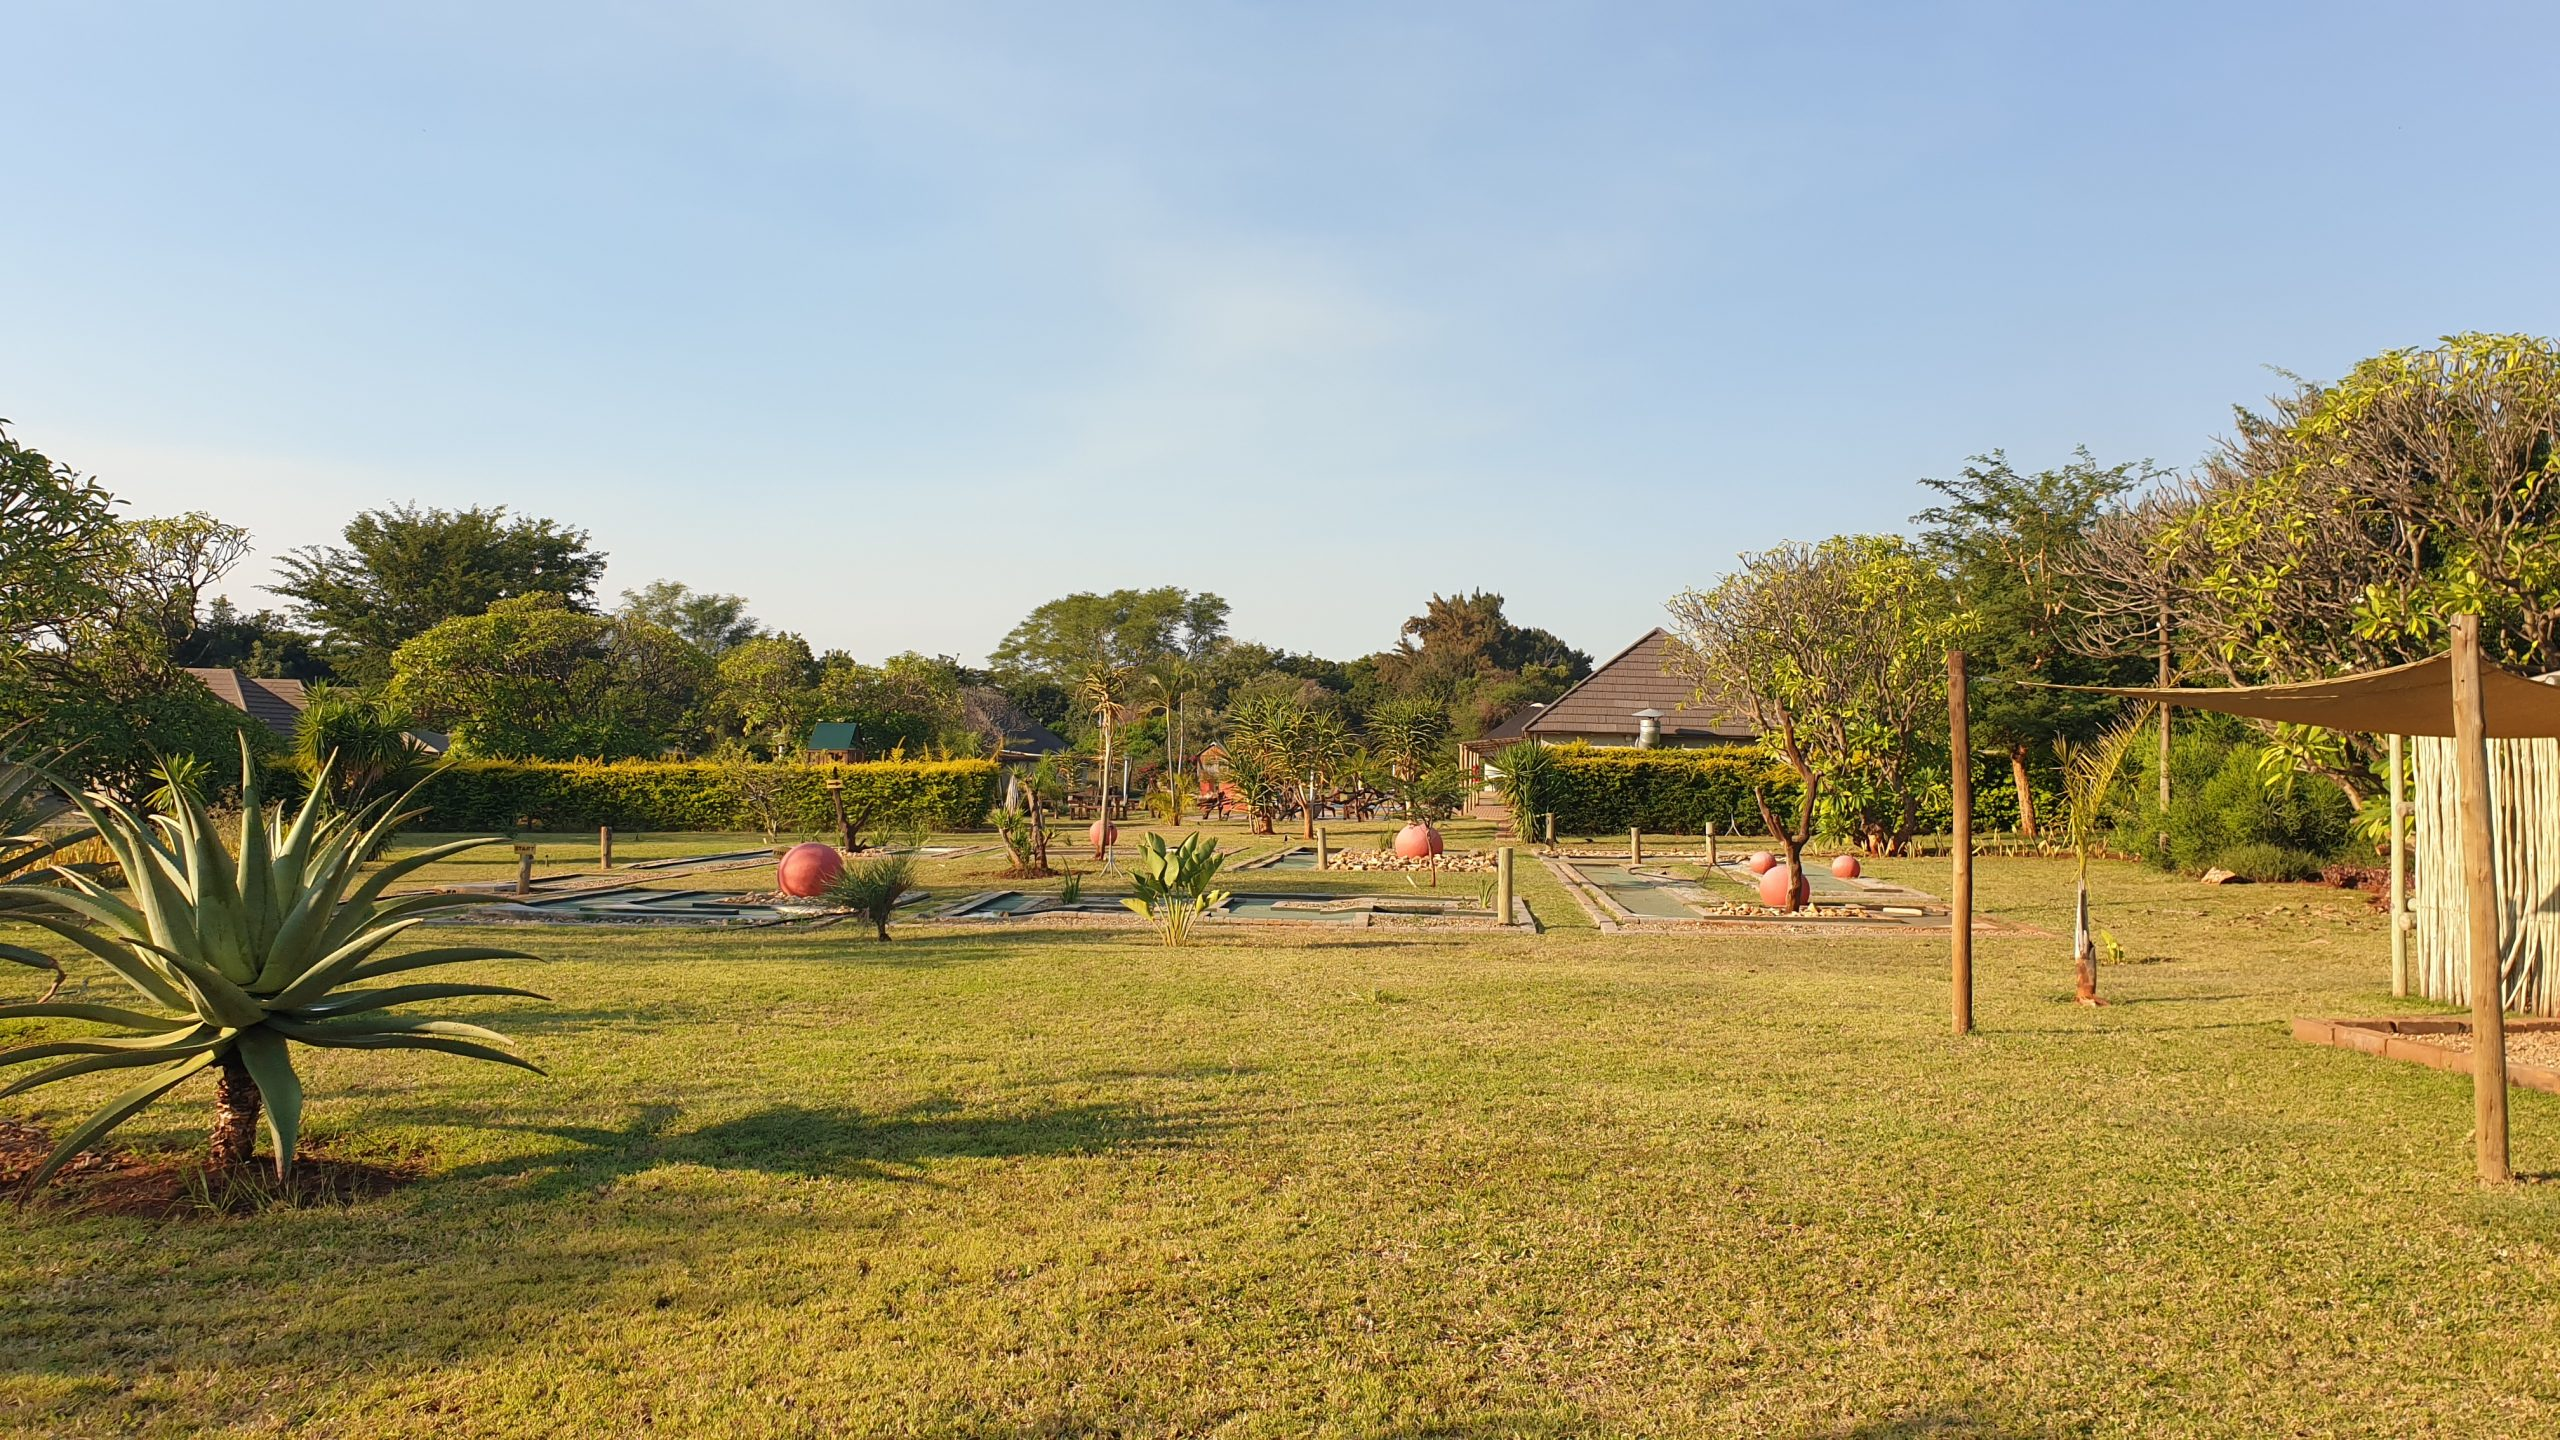 Accommodation in Malelane